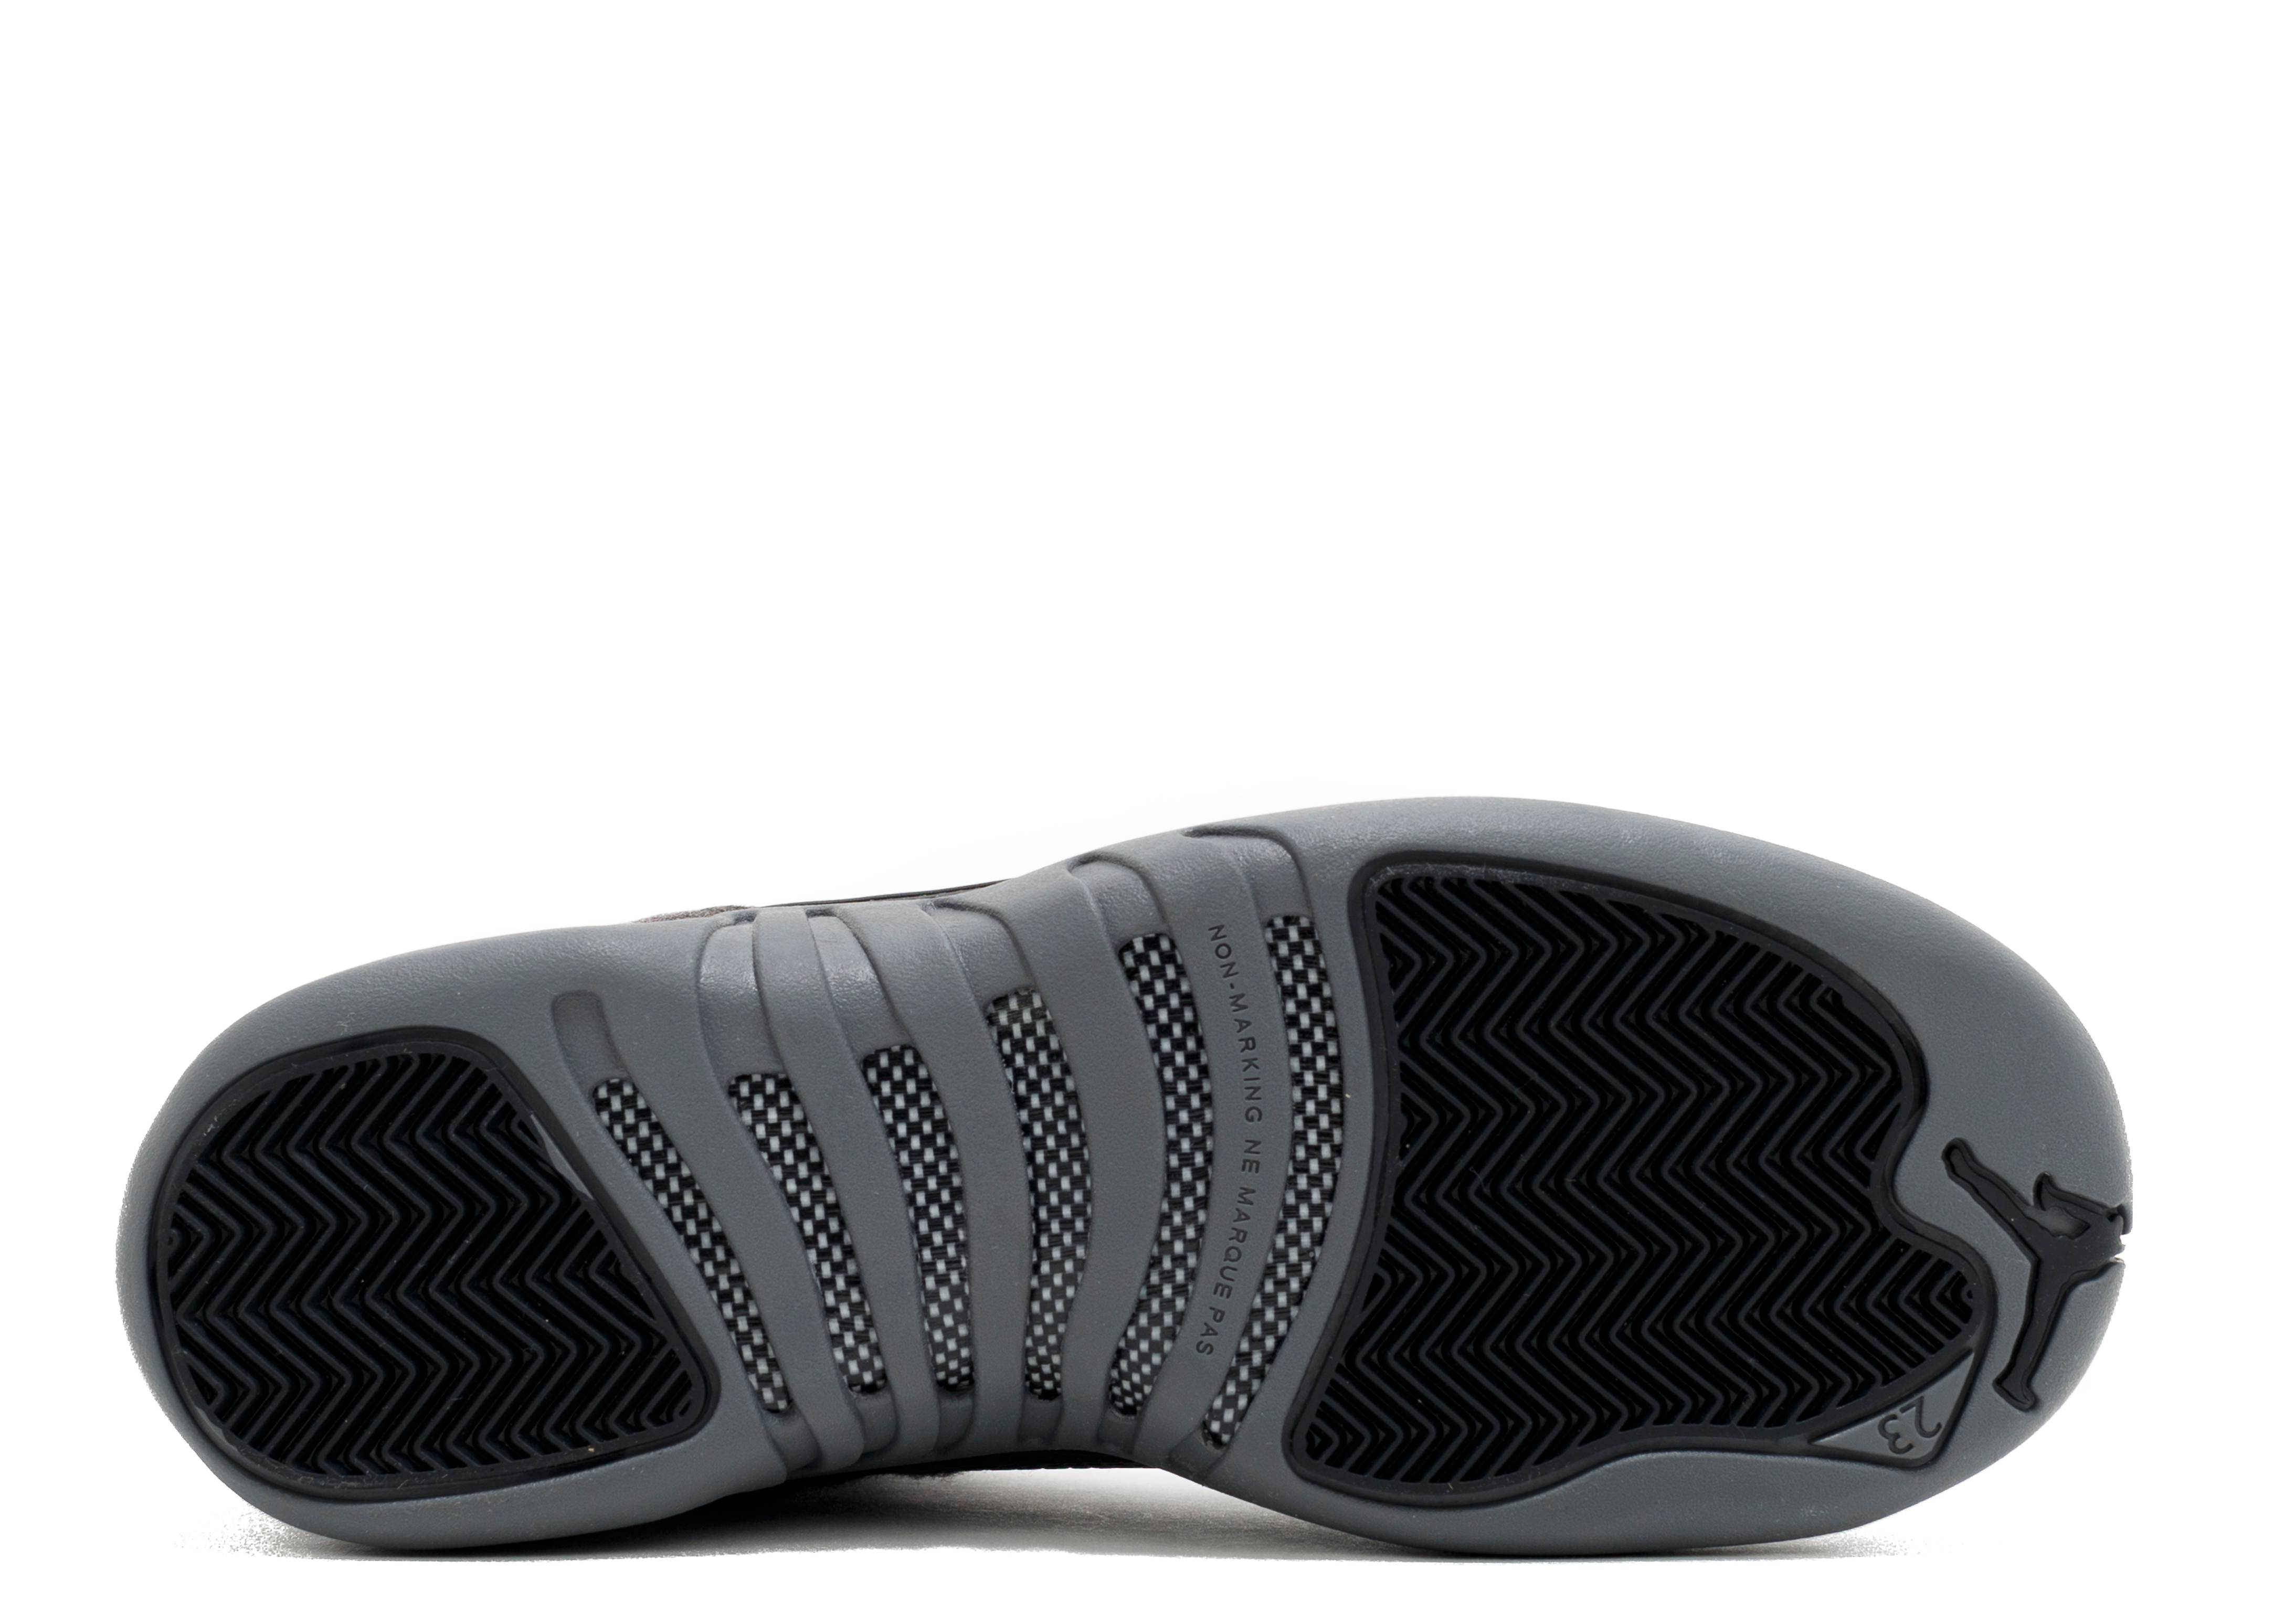 26f48db76e3899 Air Jordan 12 Retro Wool Bg (gs) - Air Jordan - 852626 003 - dark  grey-metallic silver-blac